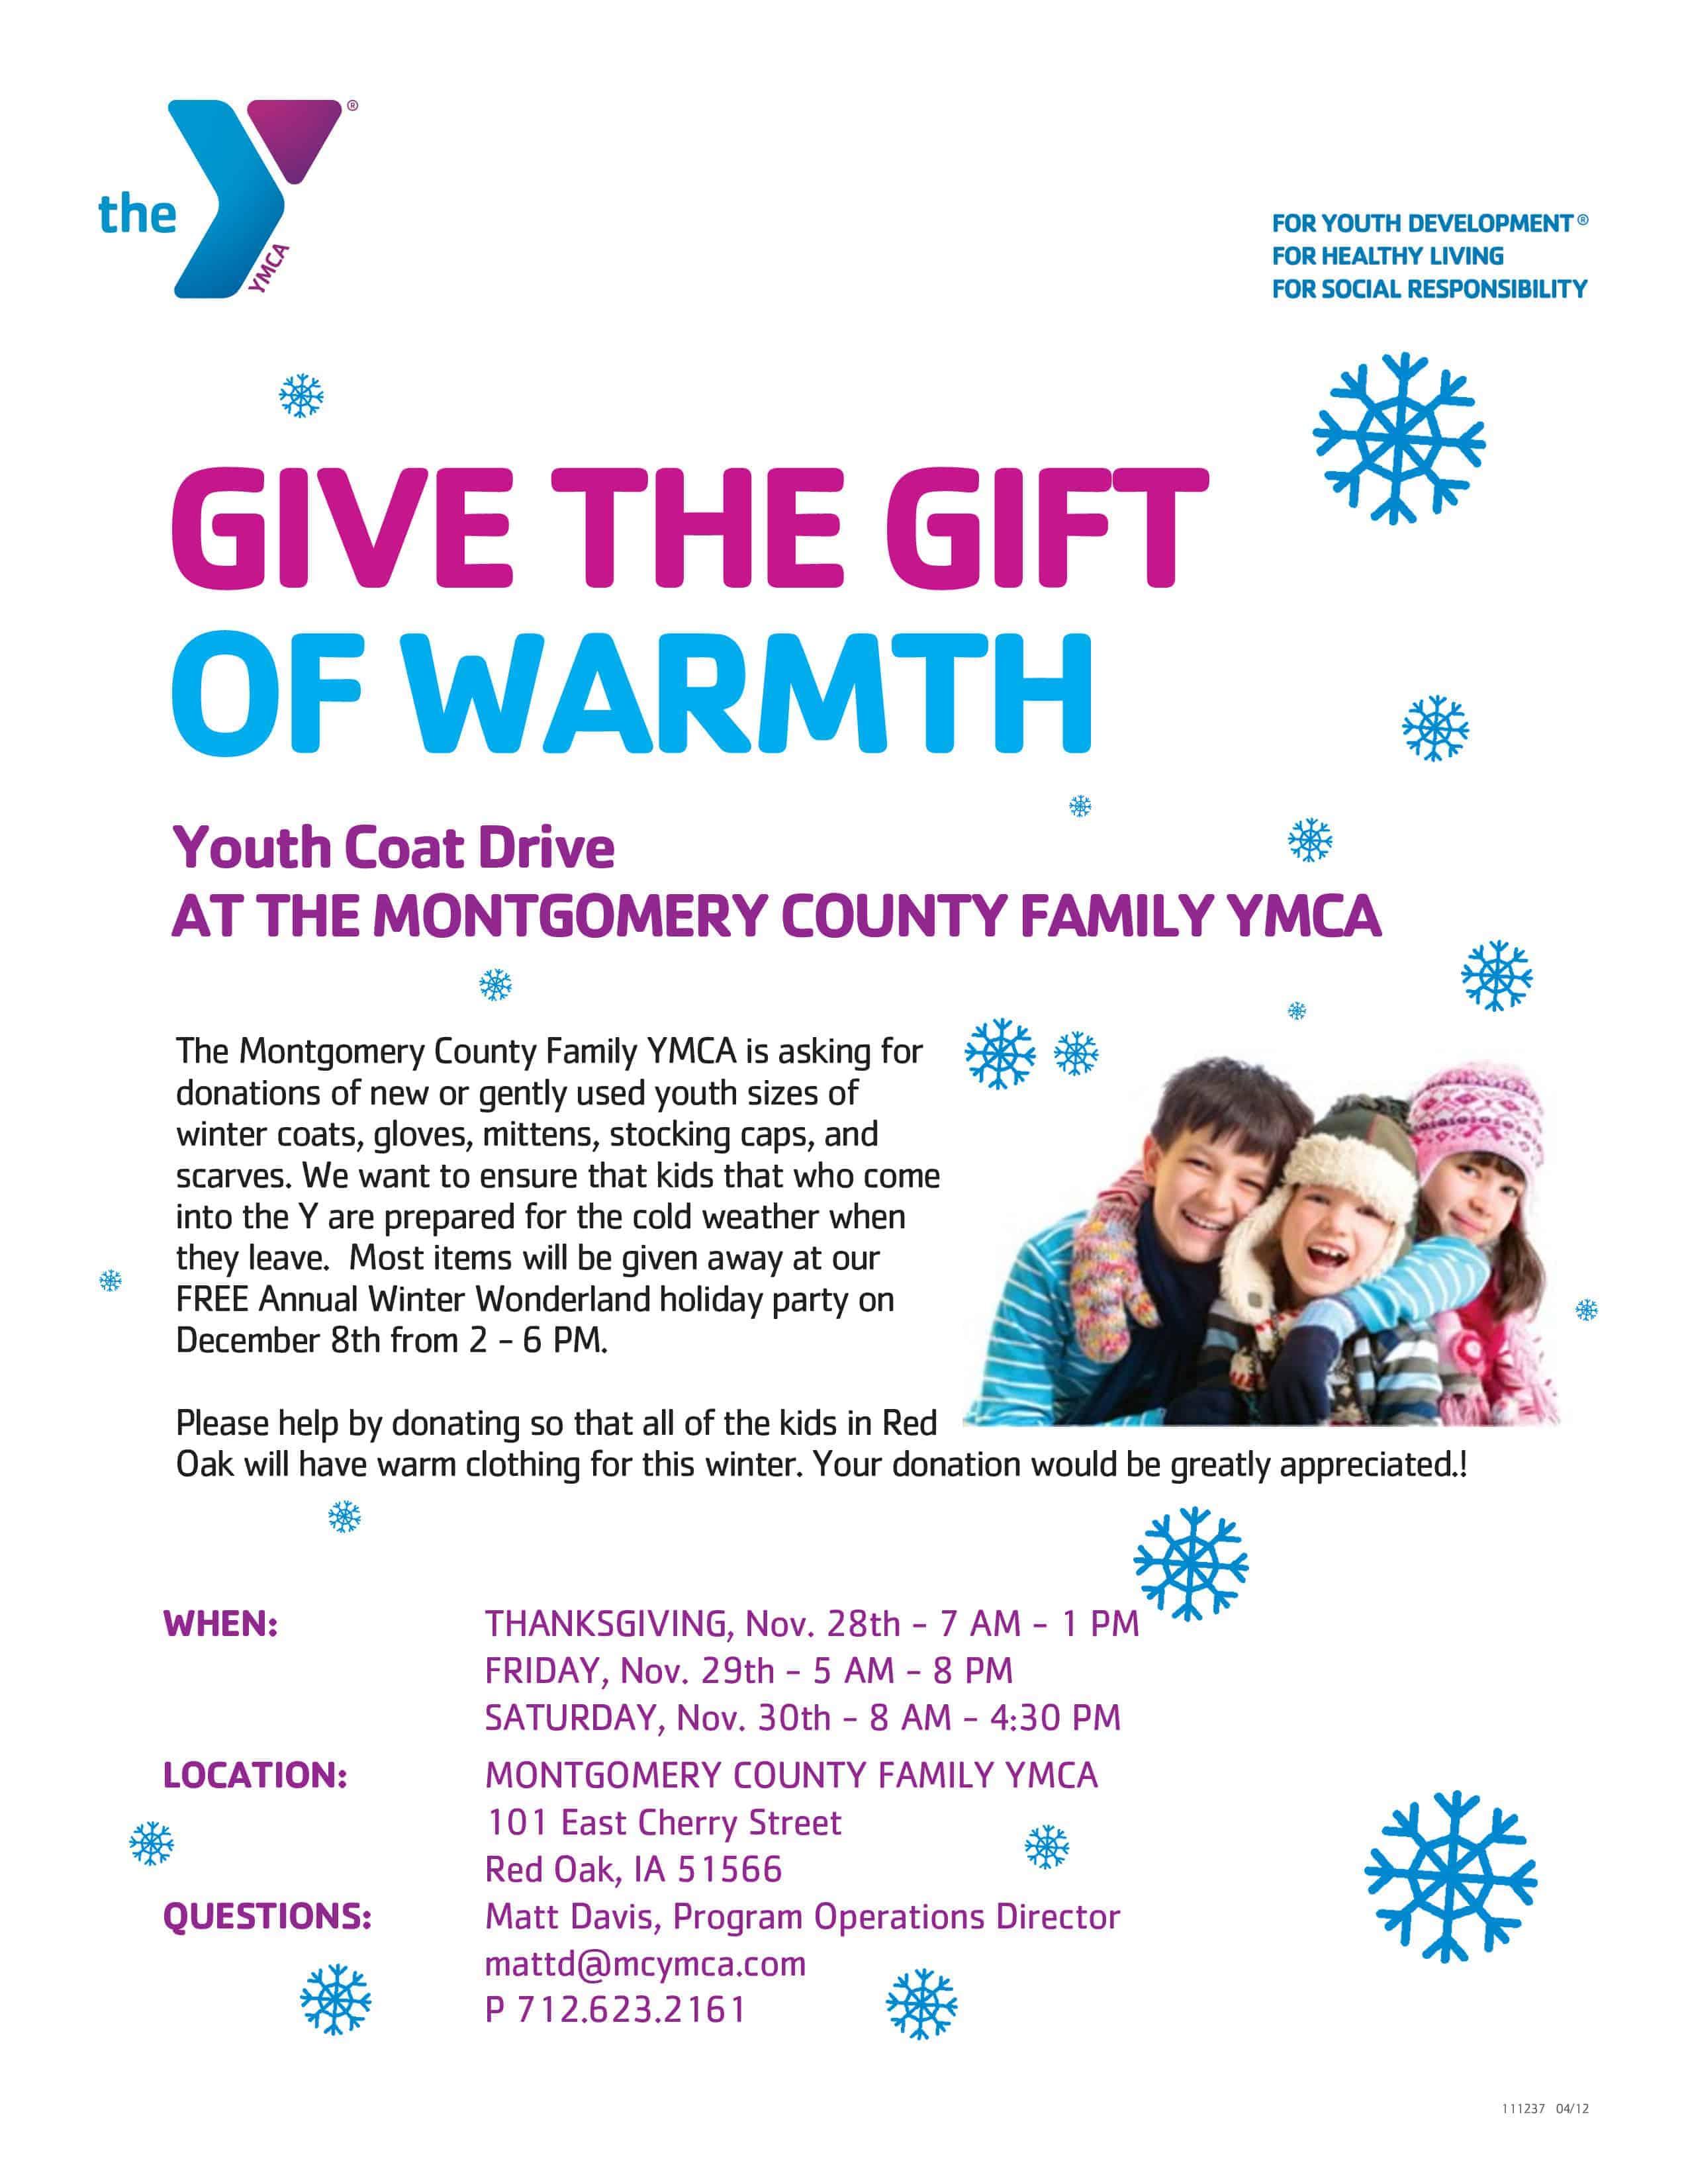 YMCA Youth Coat Drive